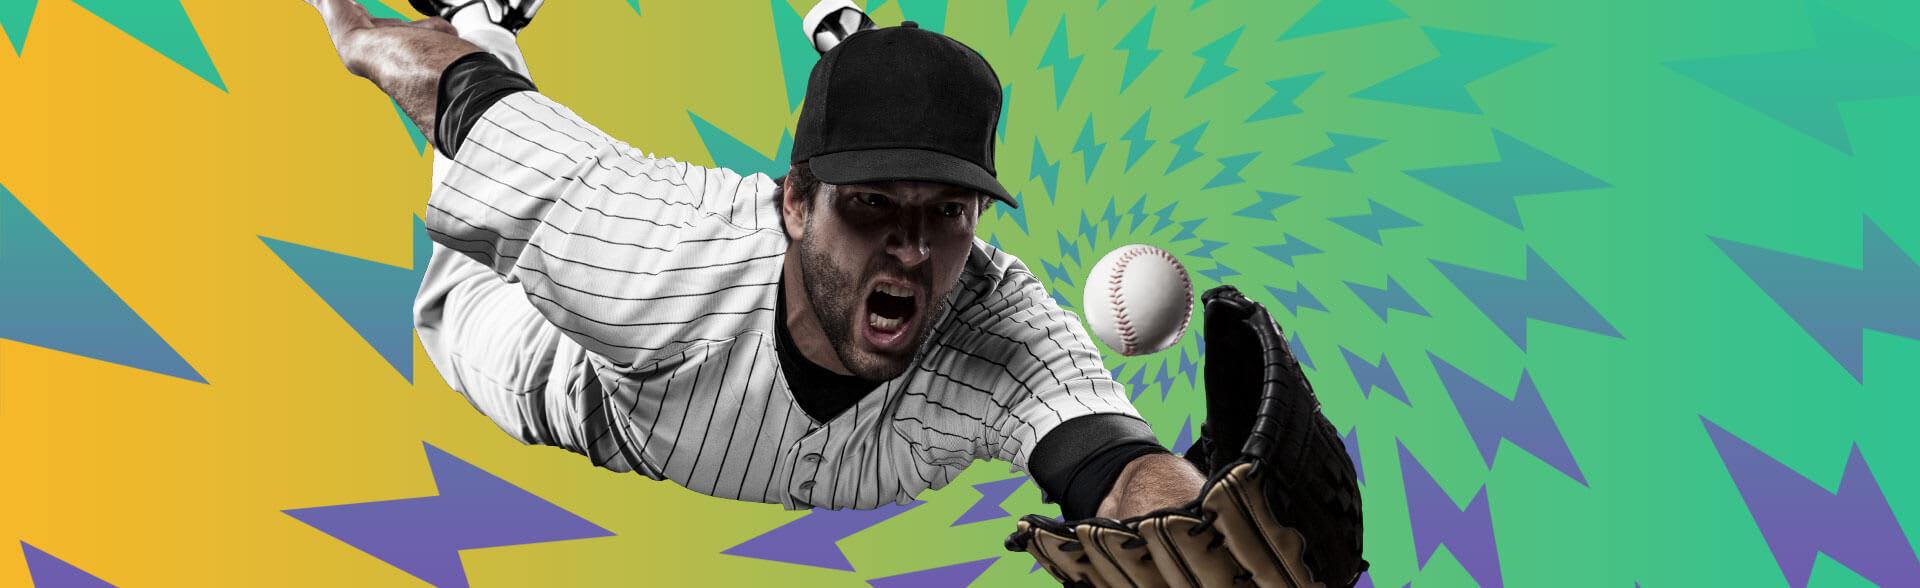 MLB: American League - A Yankees year?